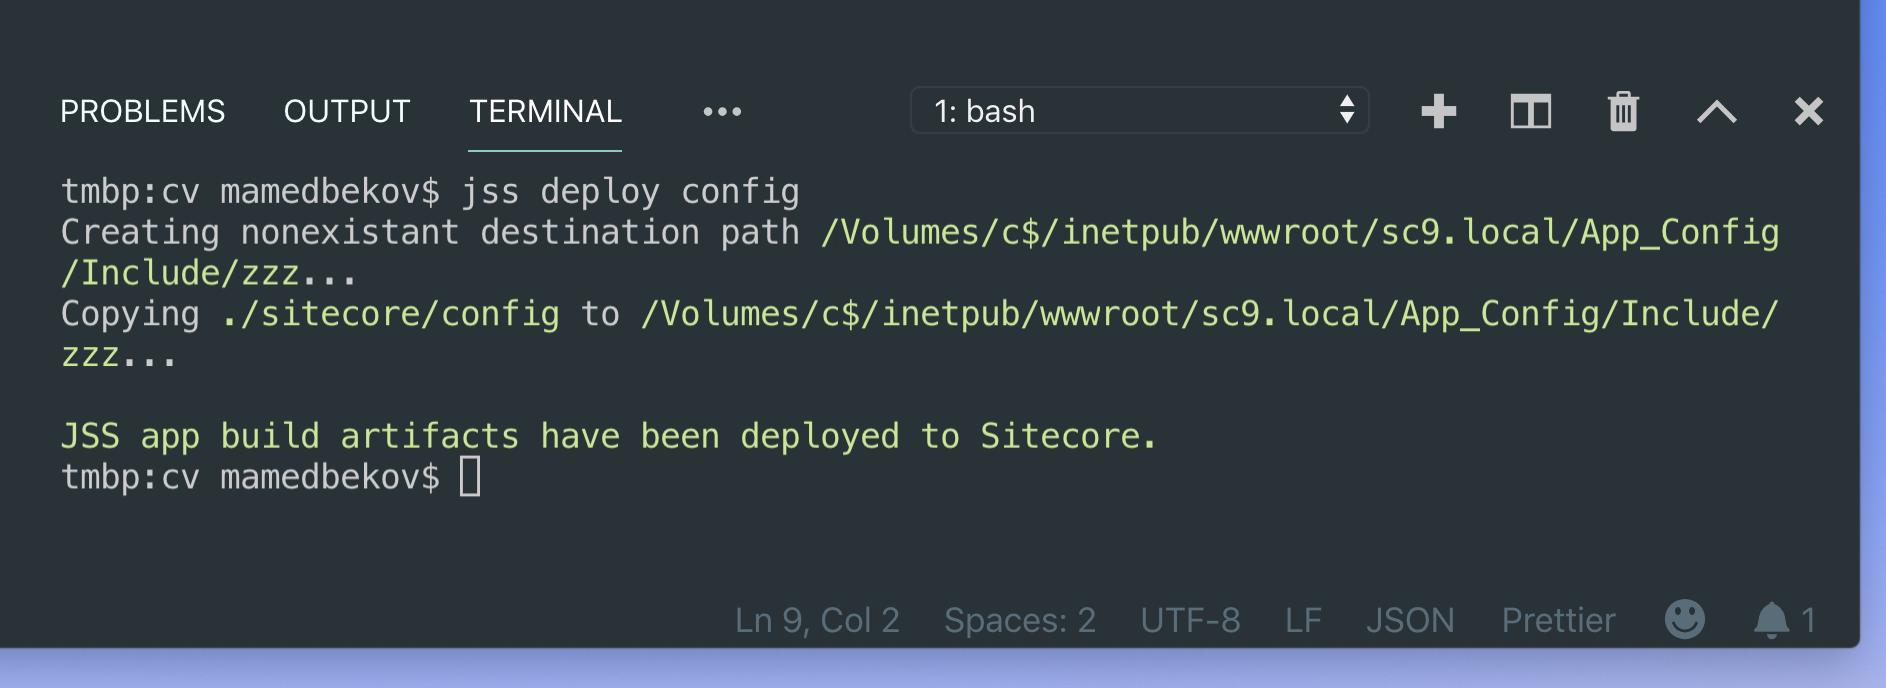 Sitecore JSS deploying configuration